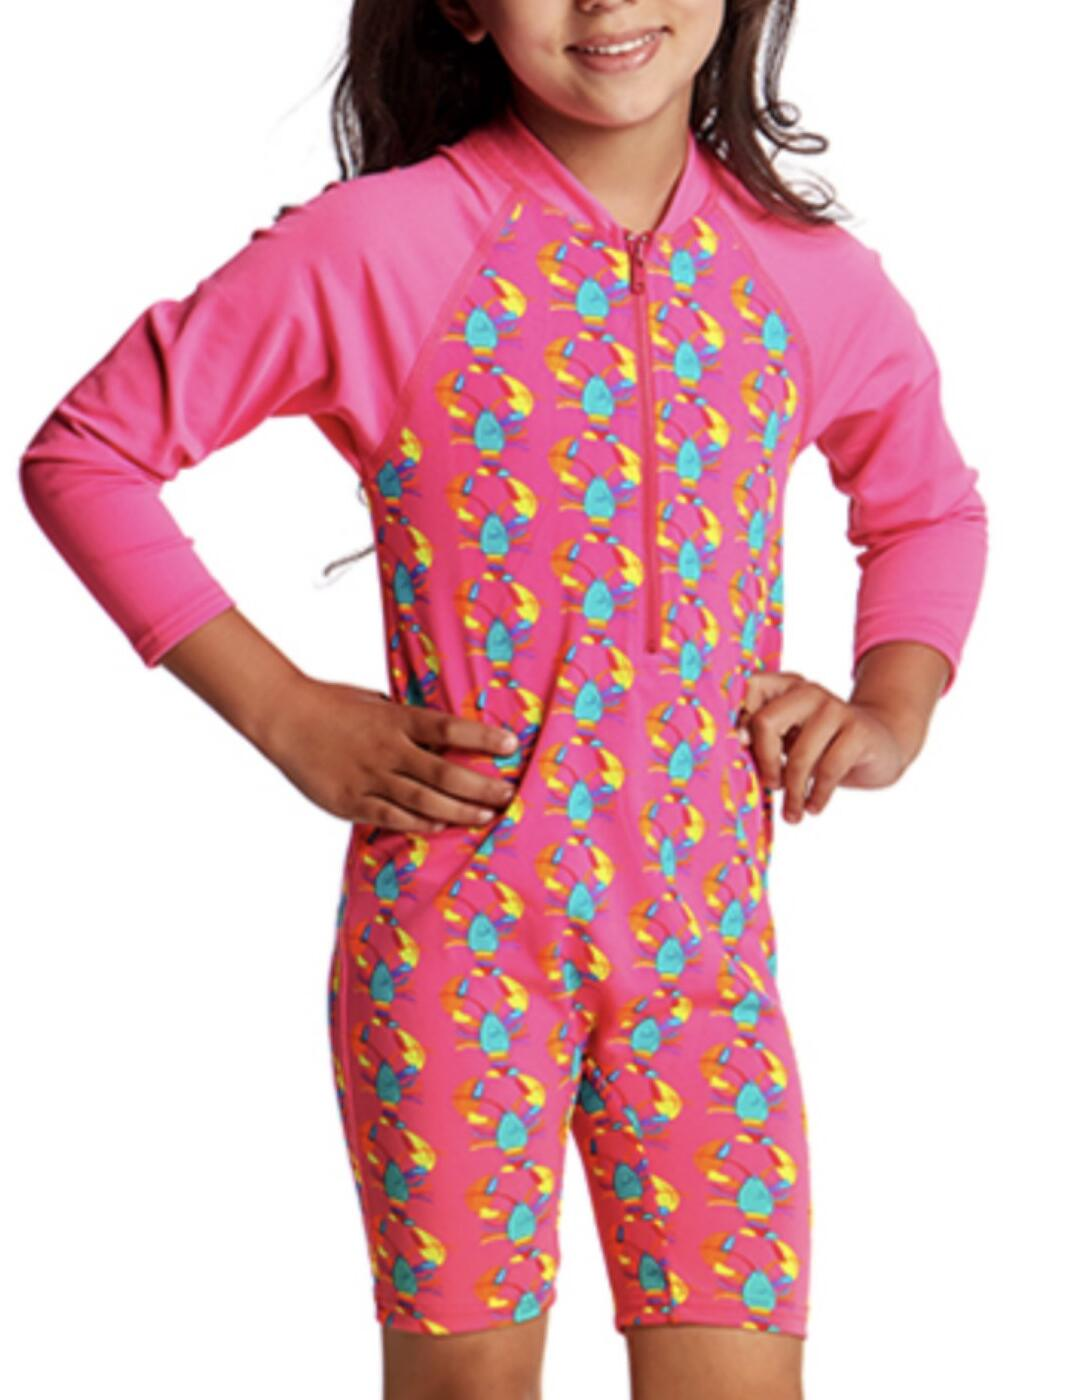 FKS005T Funkita Toddler Girls Go Jump Suit - FKS005T01197 Cray Cray